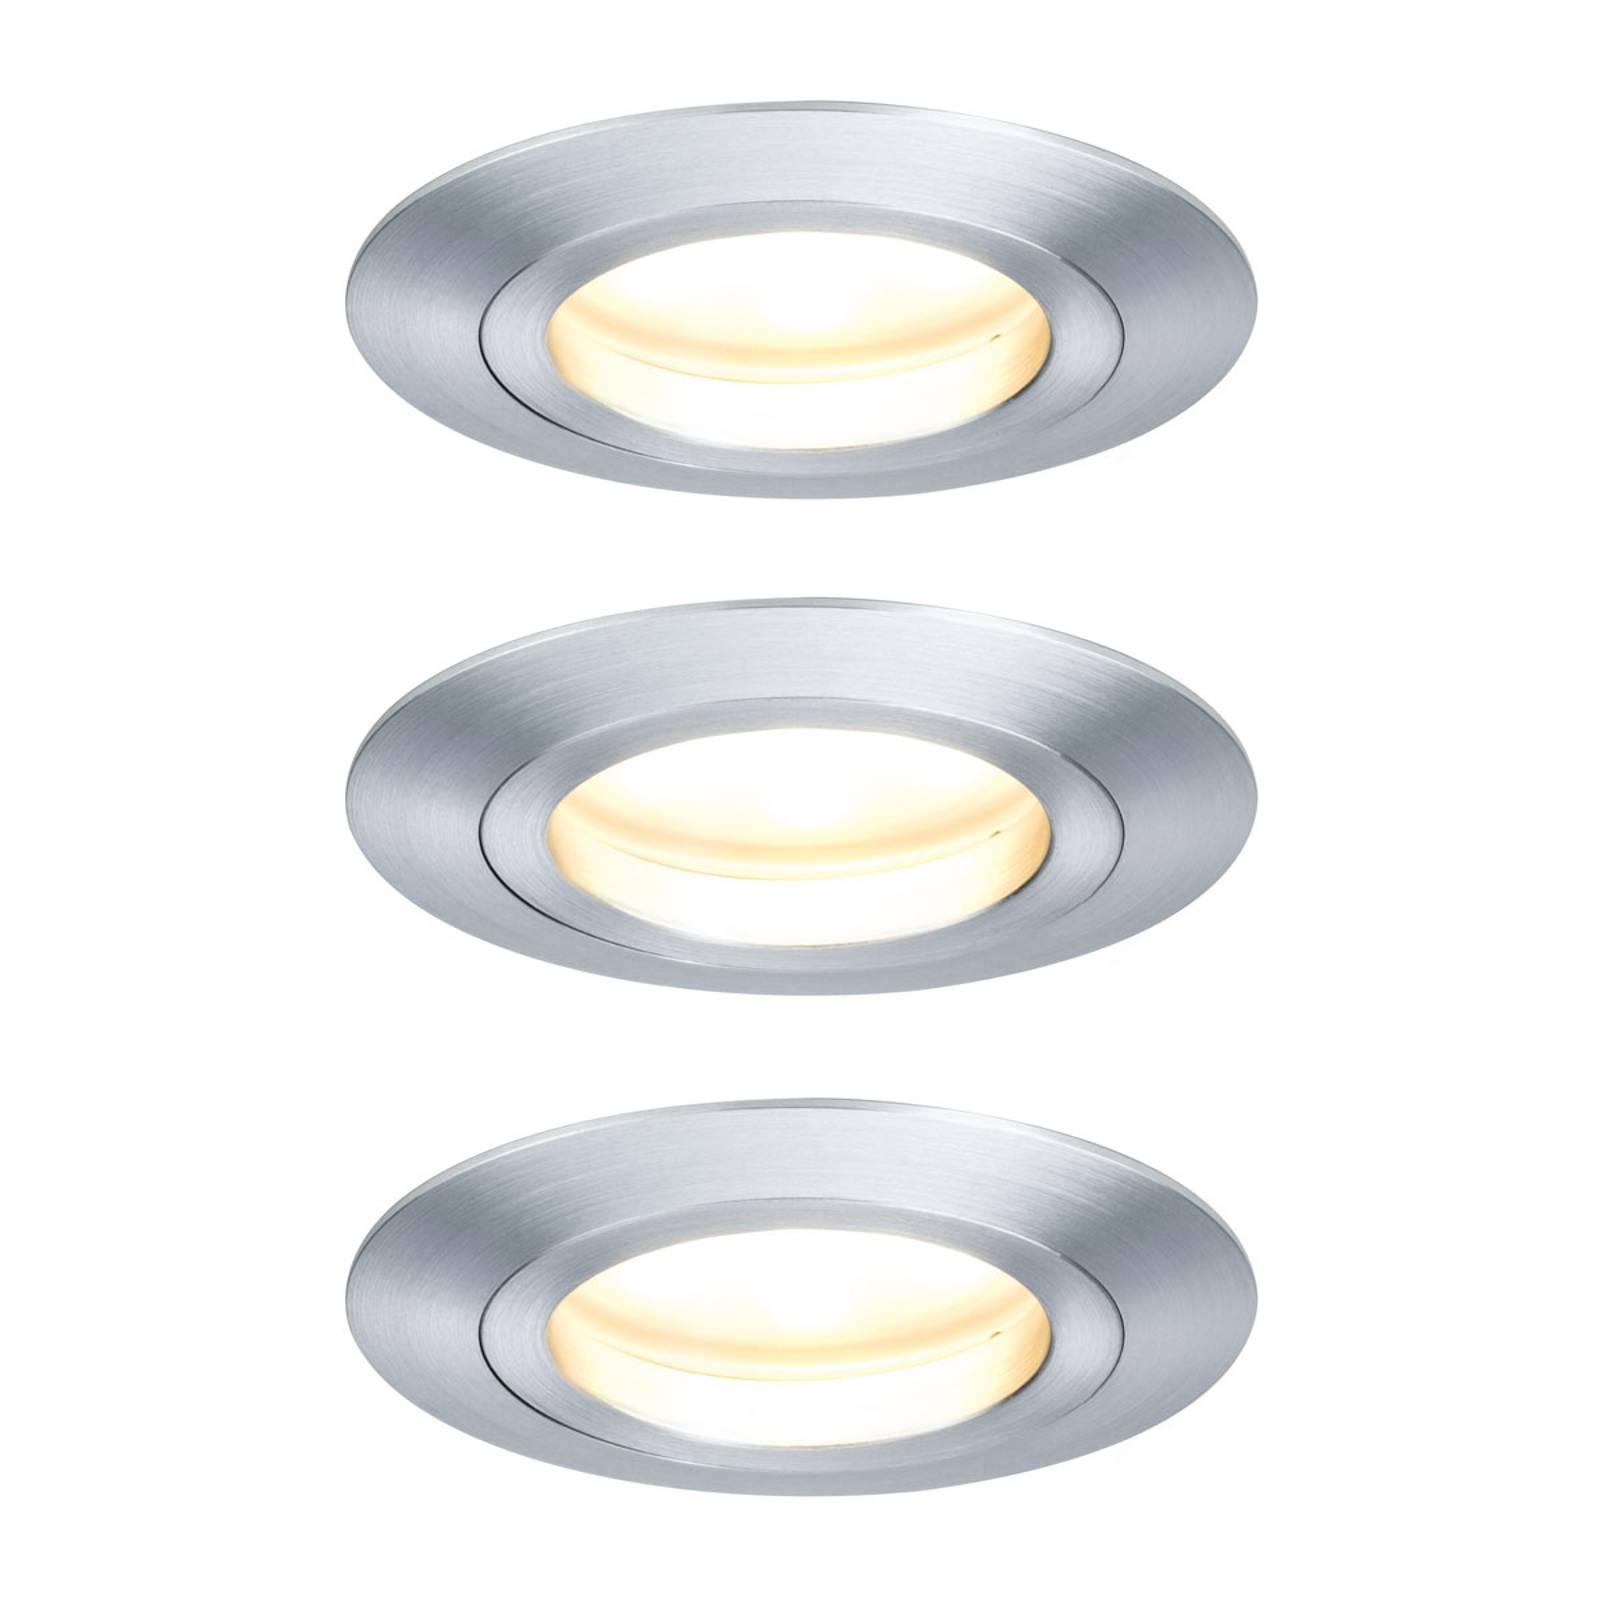 Paulmann 3 LED-spottia, 7 W, himmennys alumiini